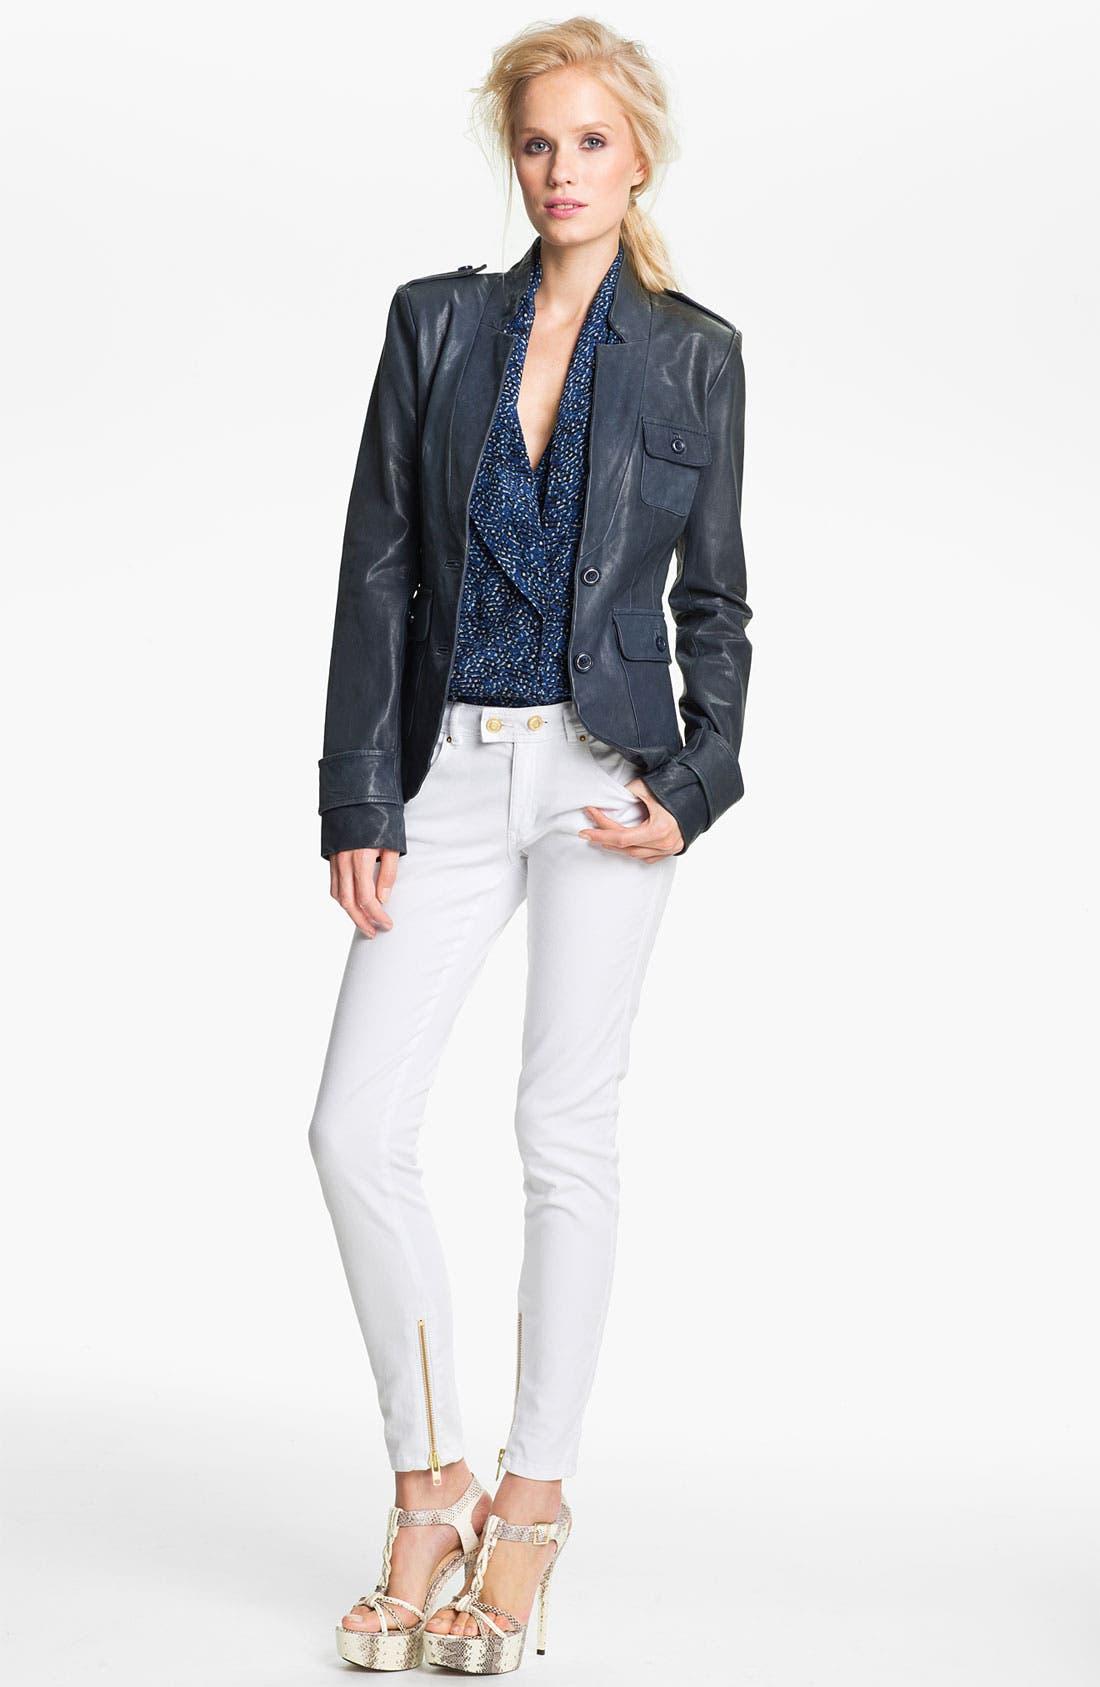 Alternate Image 1 Selected - Rachel Zoe 'Finn' Leather Jacket